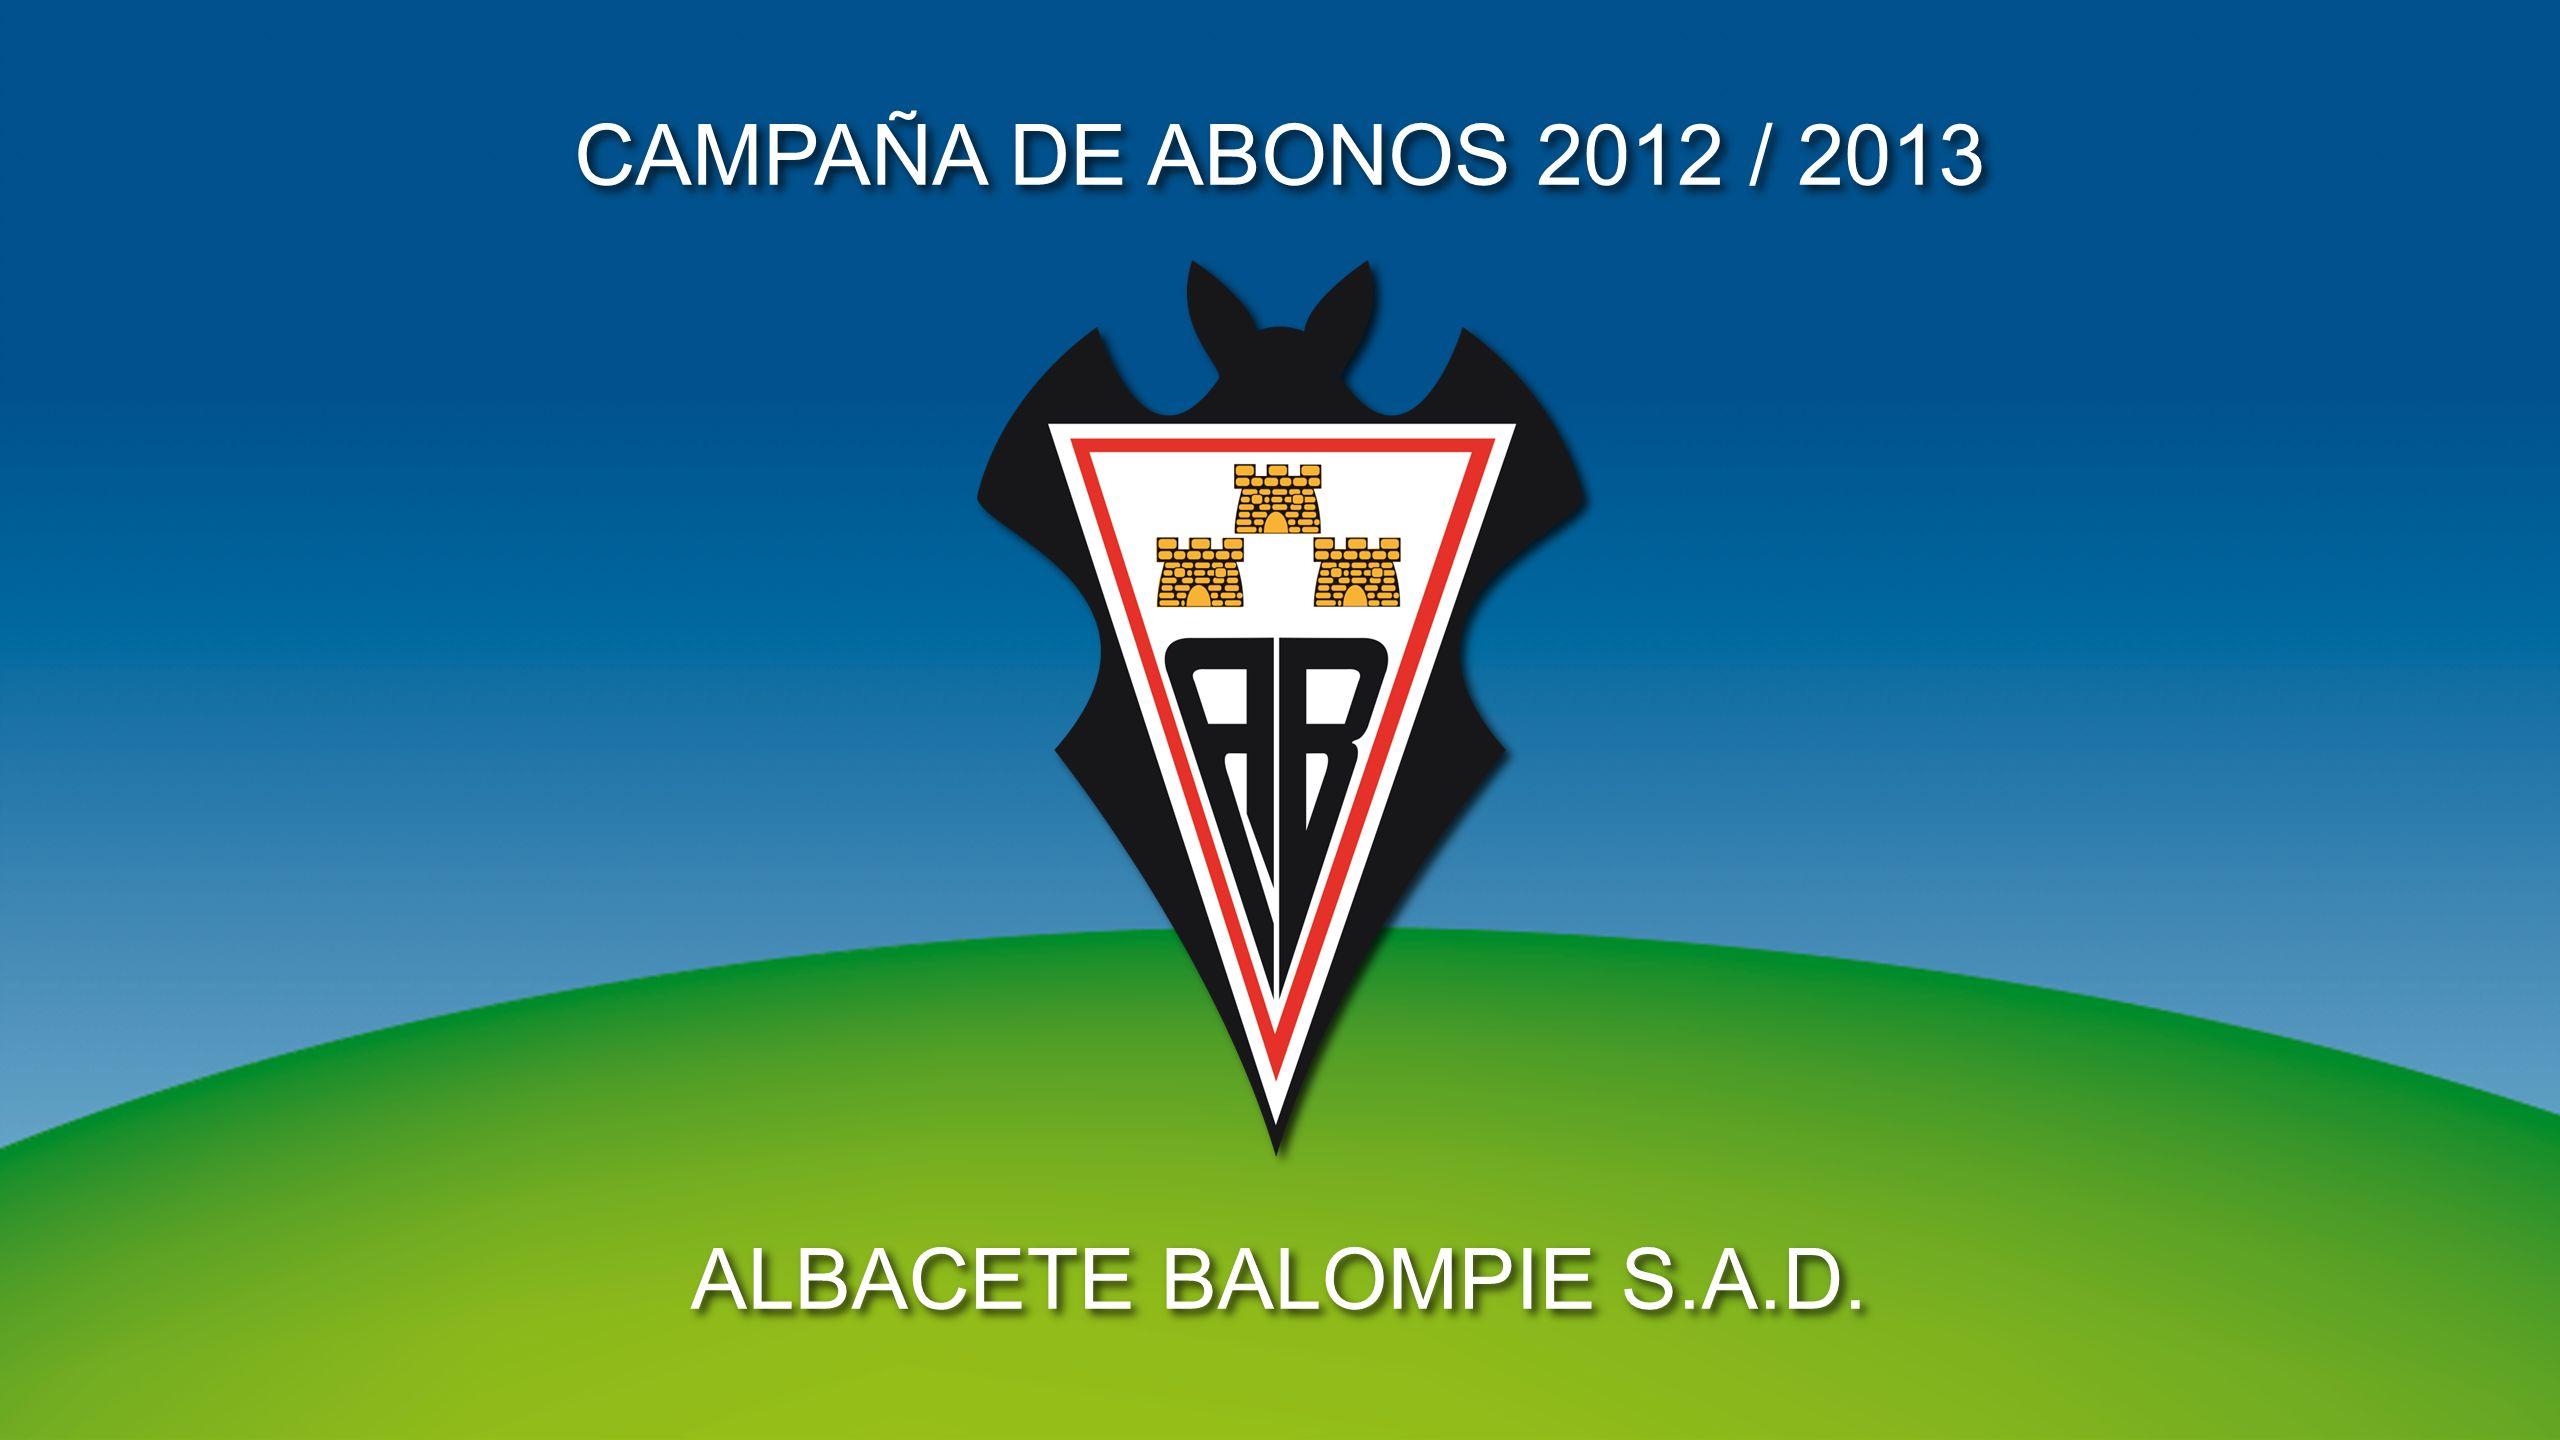 CAMPAÑA DE ABONOS 2012 / 2013 ALBACETE BALOMPIE S.A.D.